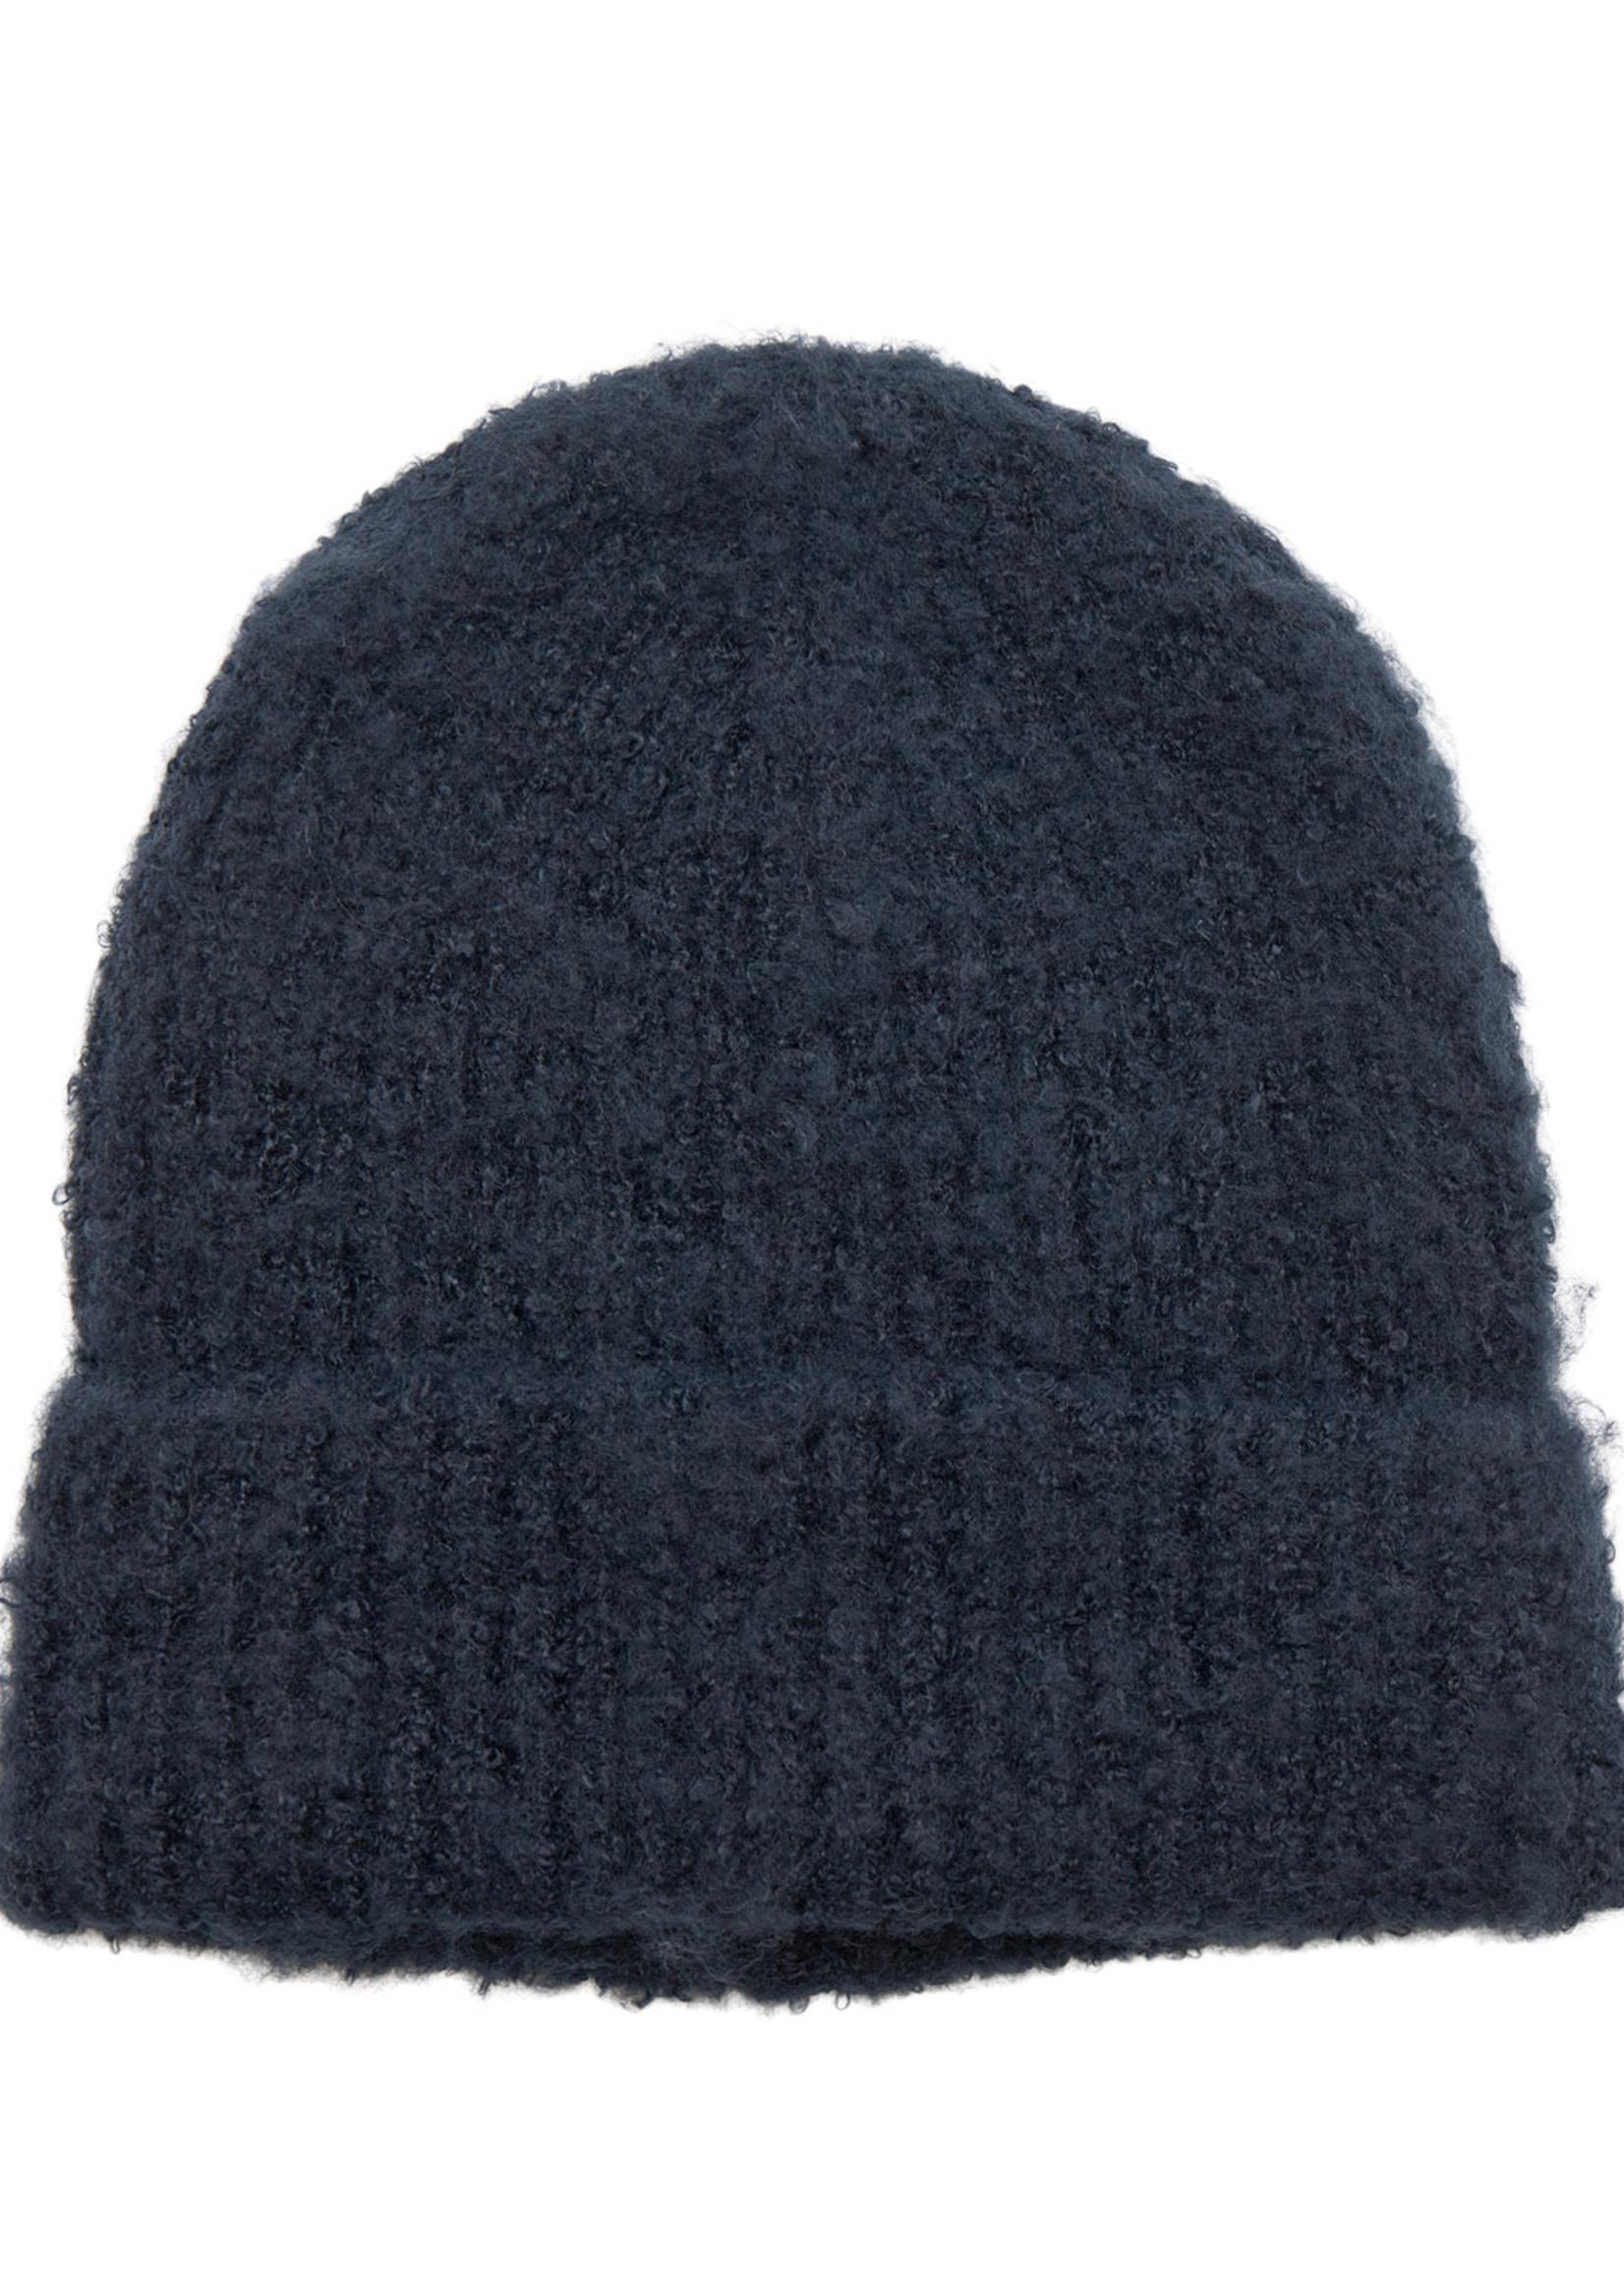 Numph Nubobbly Hat